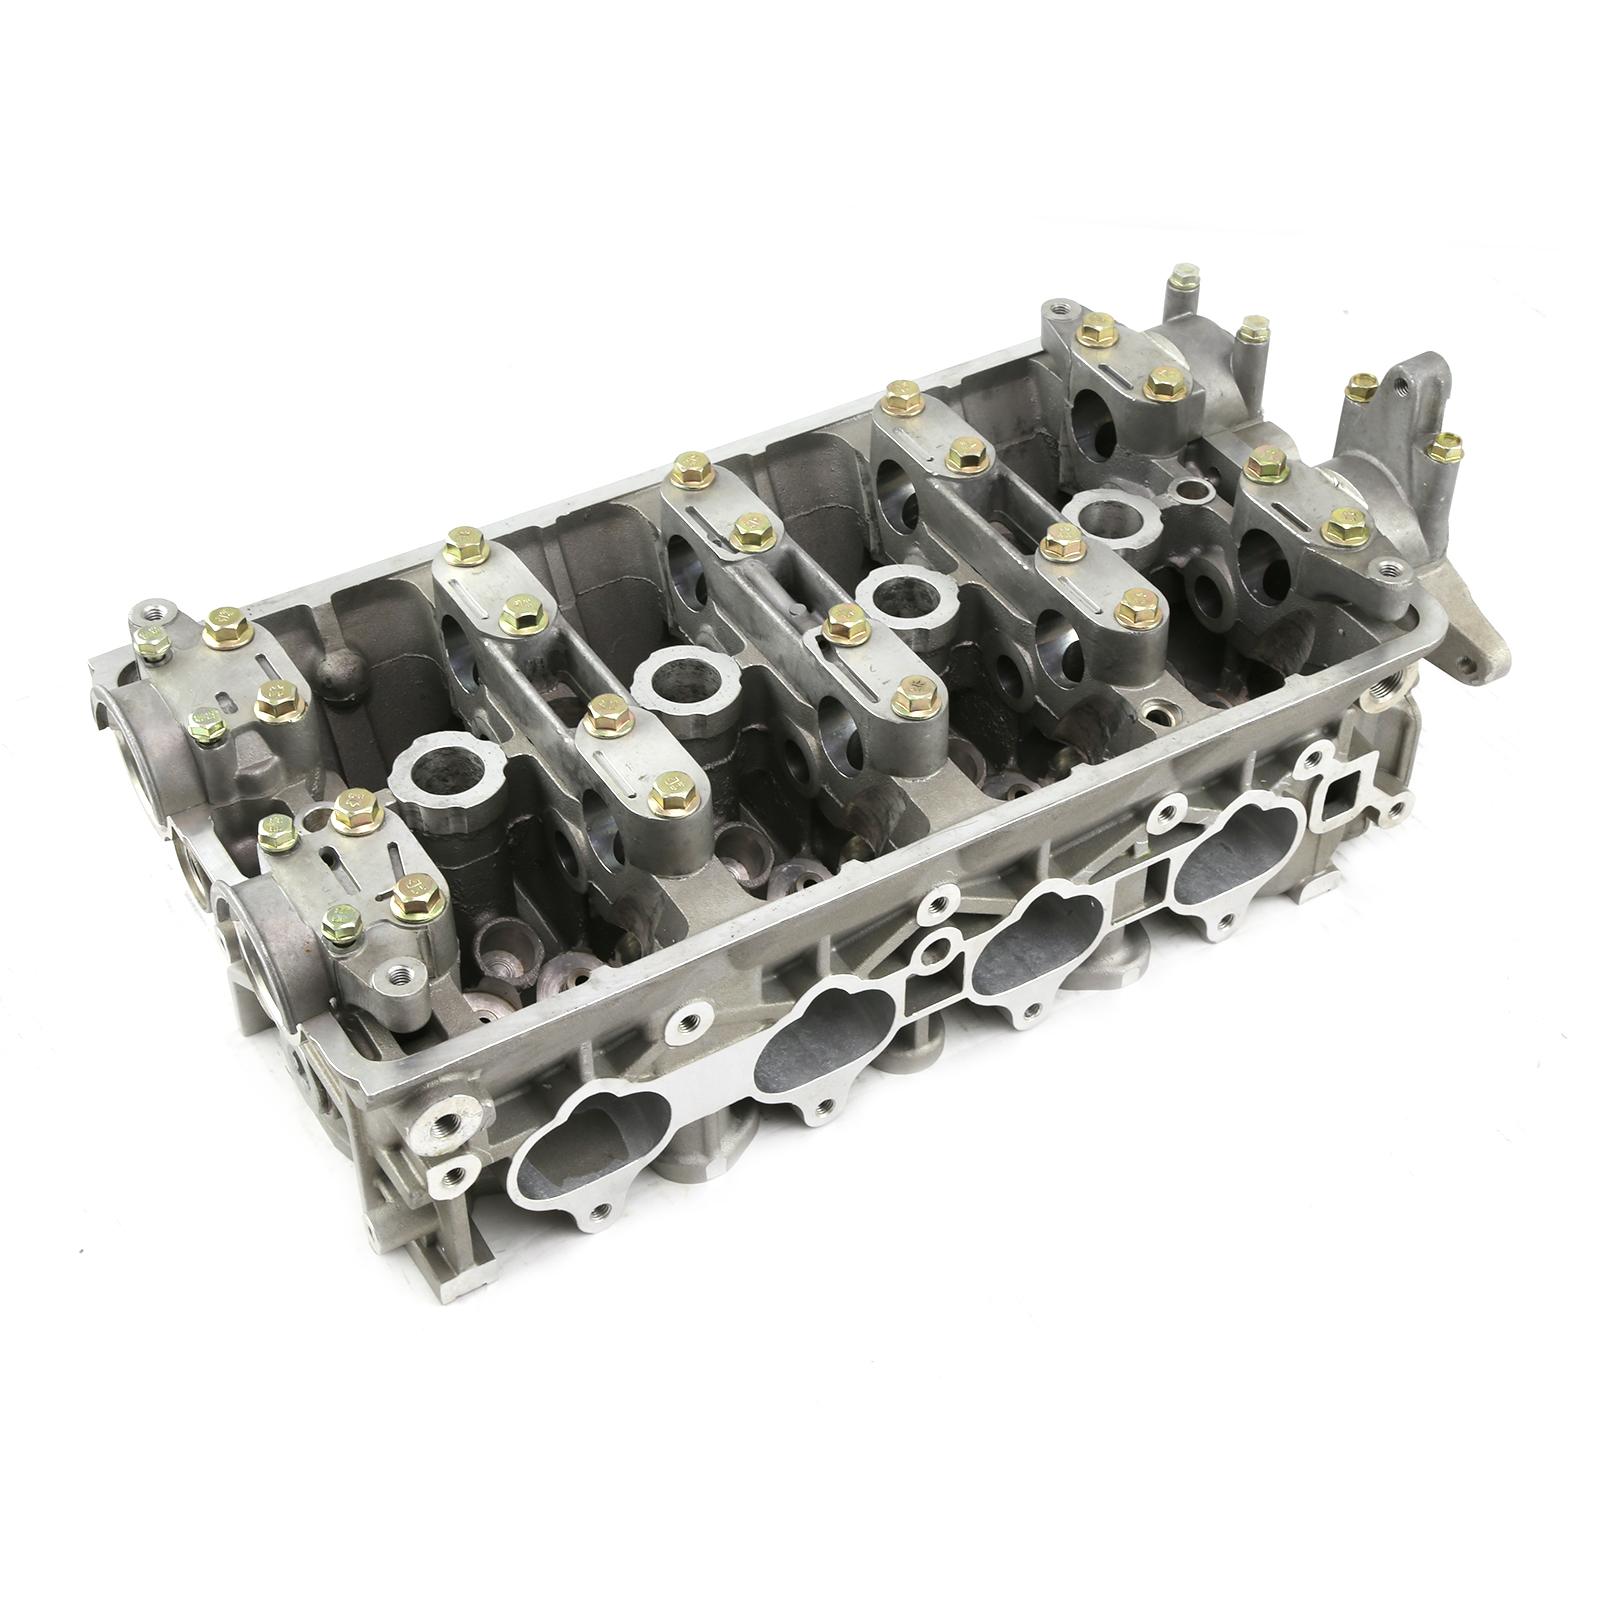 Honda 4Cyl B16A Vtec Full CNC Aluminum Bare Cylinder Head